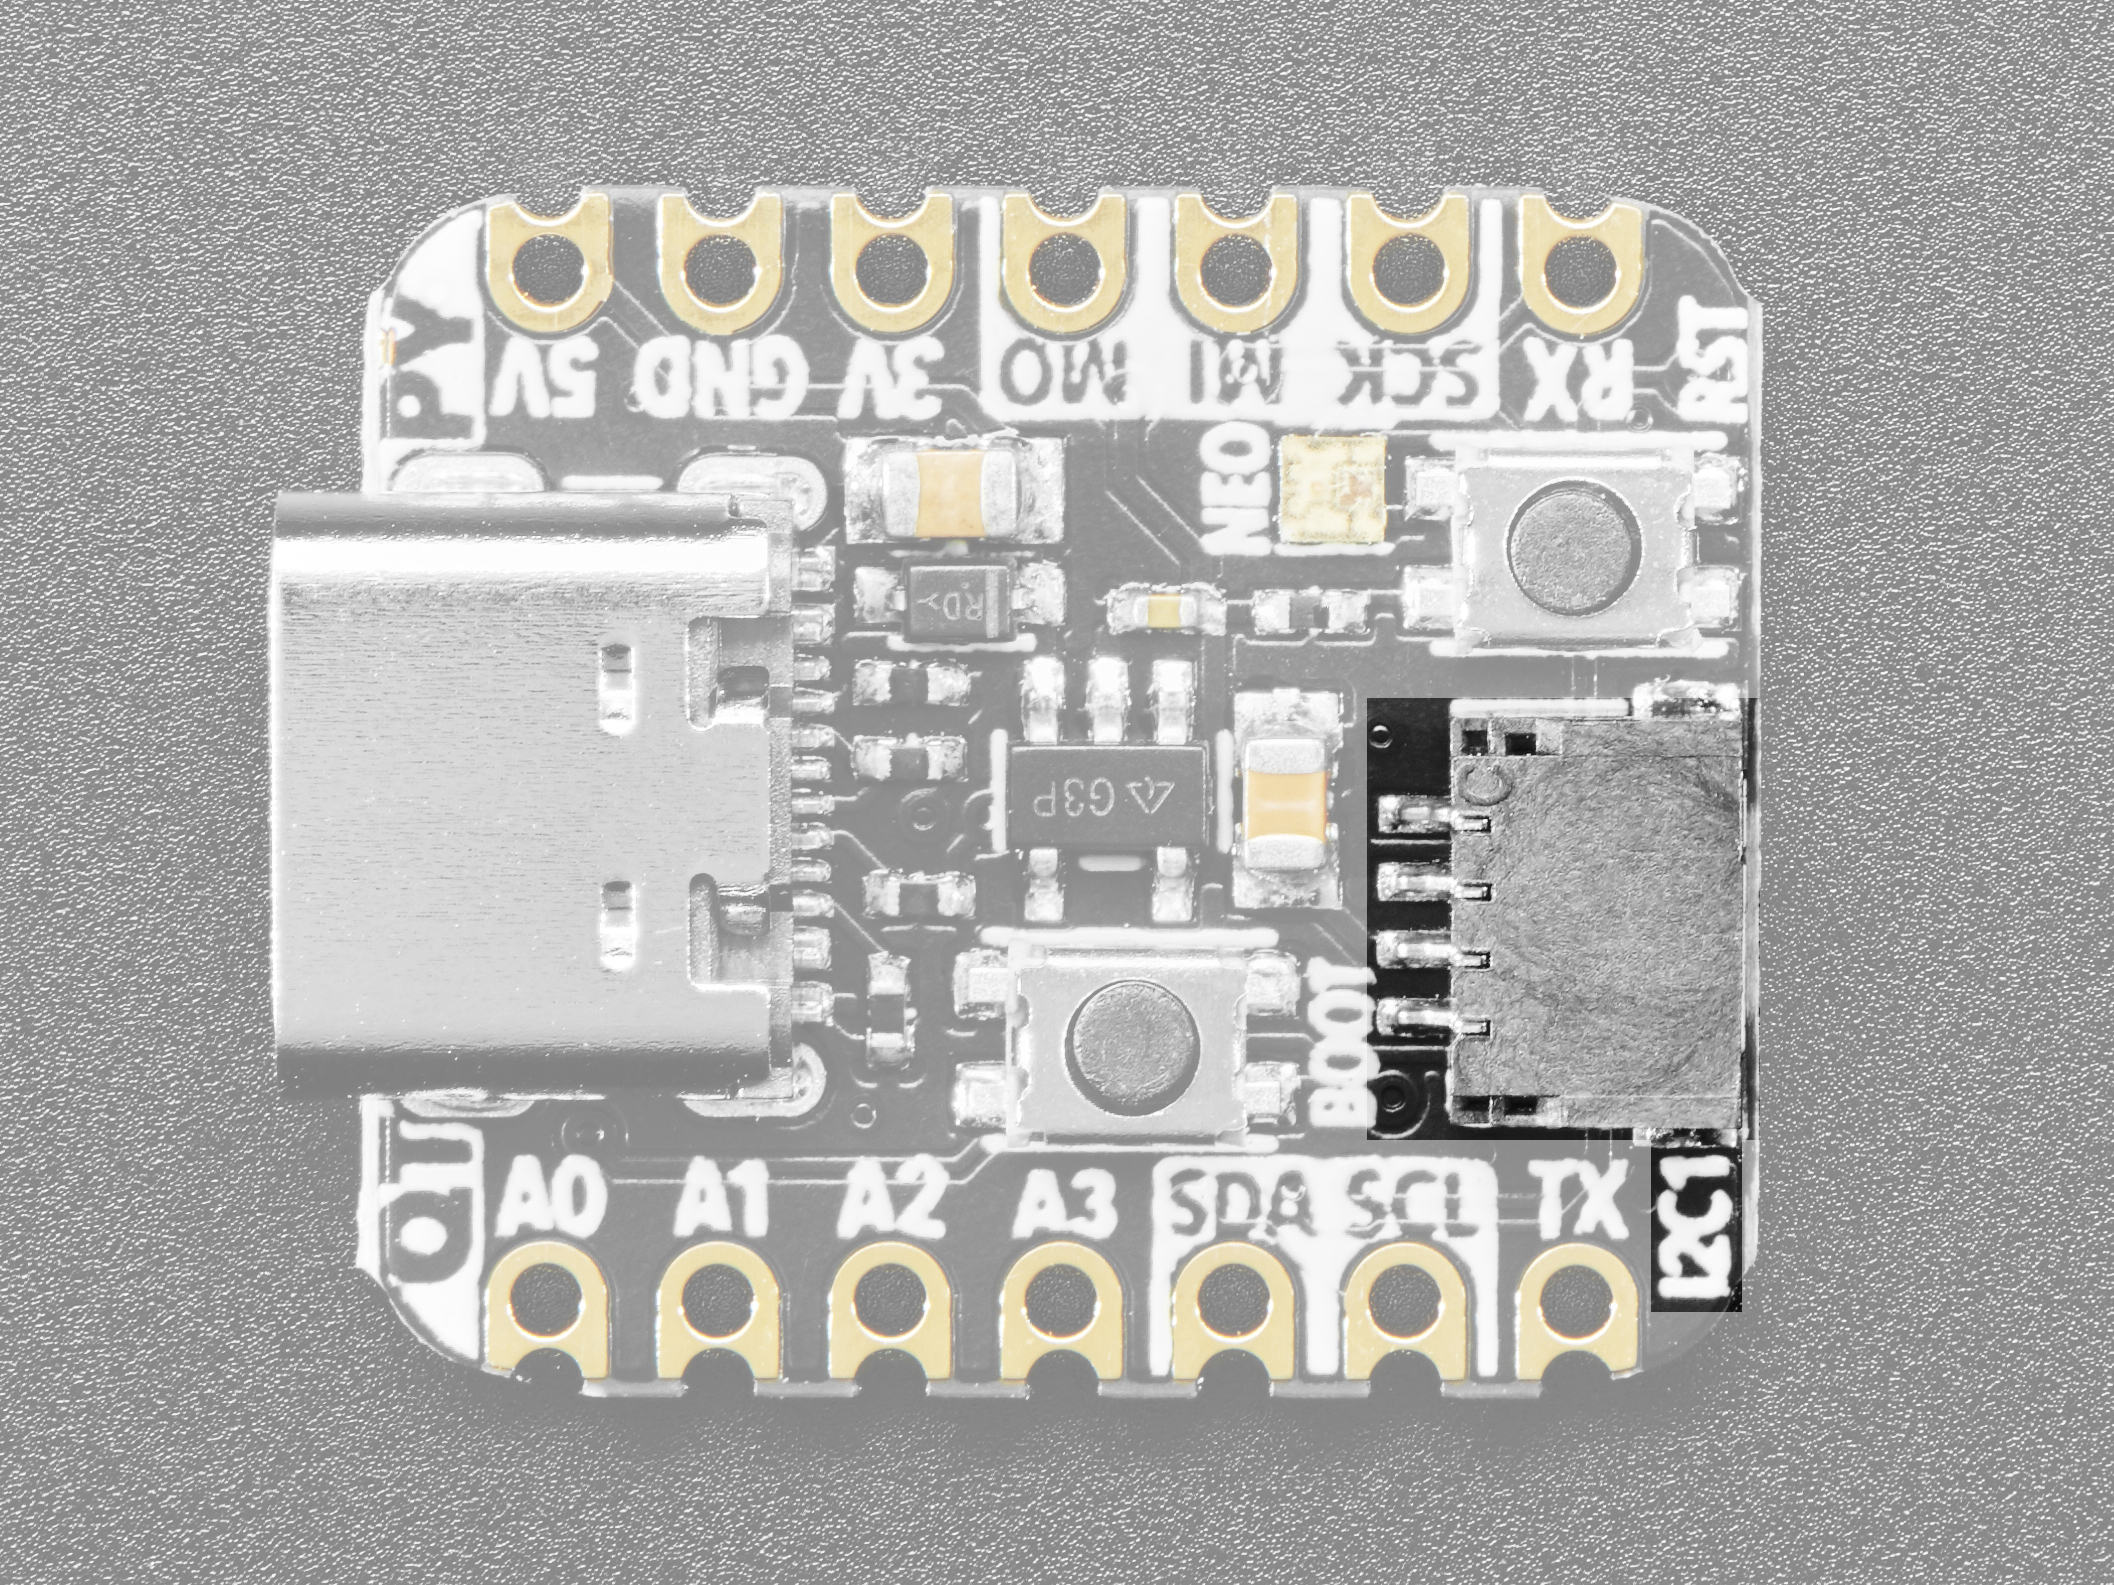 adafruit_products_QTRP_pinouts_STEMMA_QT.jpg